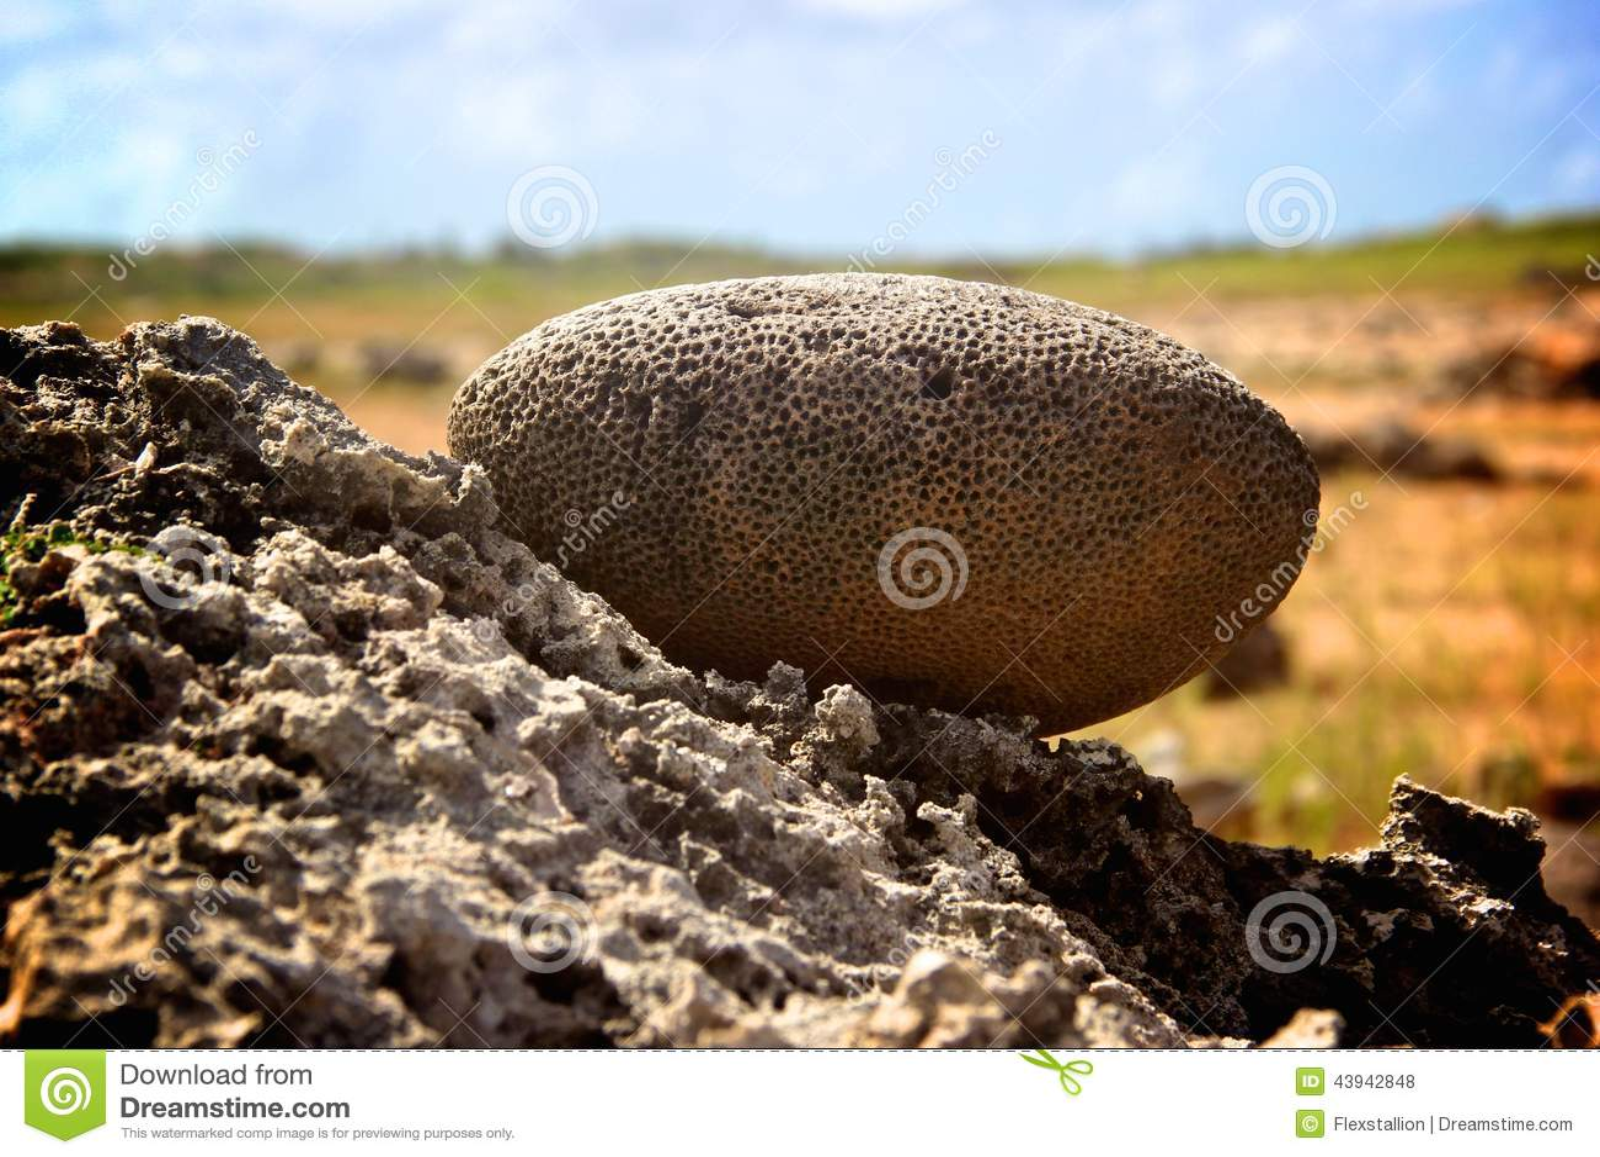 Brain Coral Near Wish Rock Garden-Aruba Stock Photo - Image of brain ...